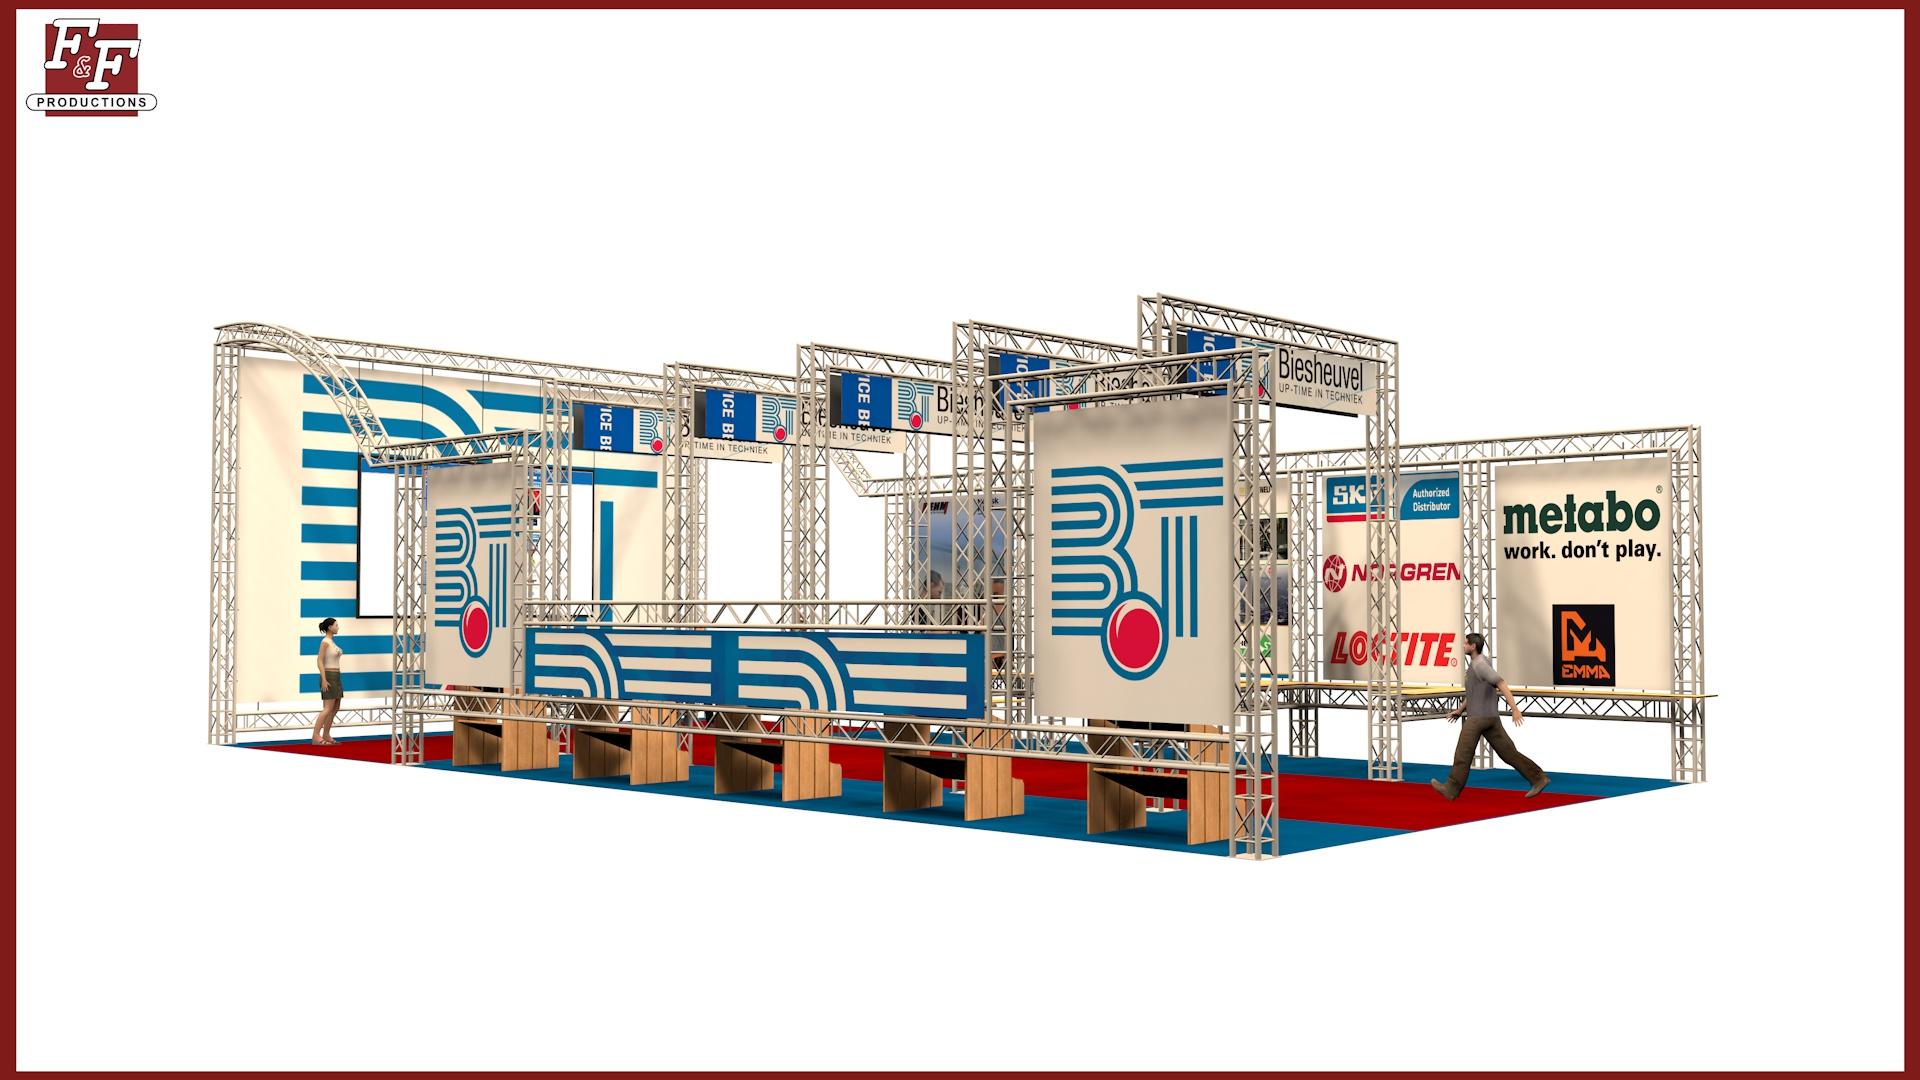 bt-stand-2014-900x1800cm-v1_0002